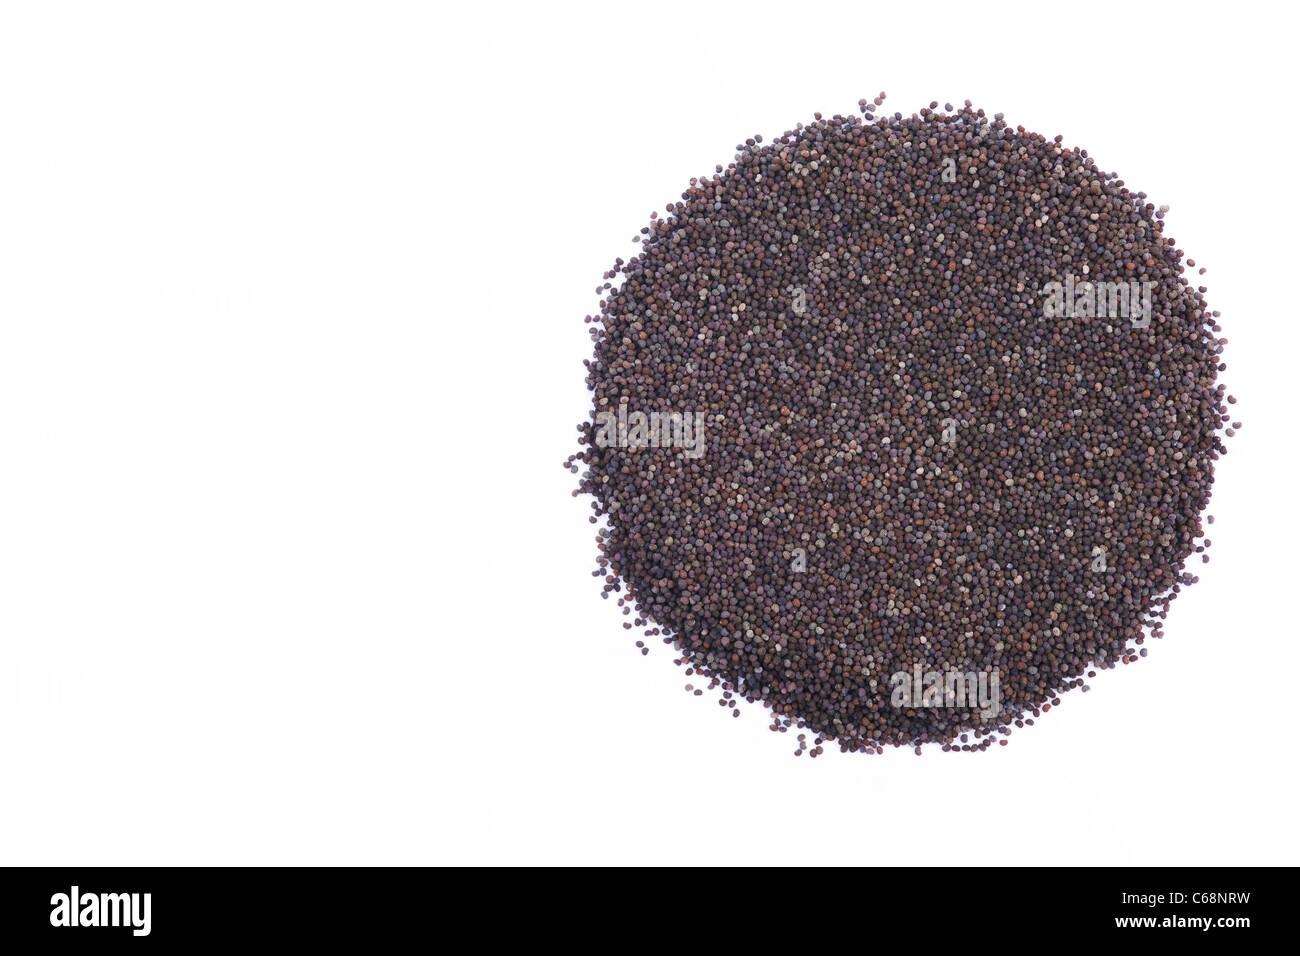 Papaver somniferum. Poppy seeds on a white background. - Stock Image